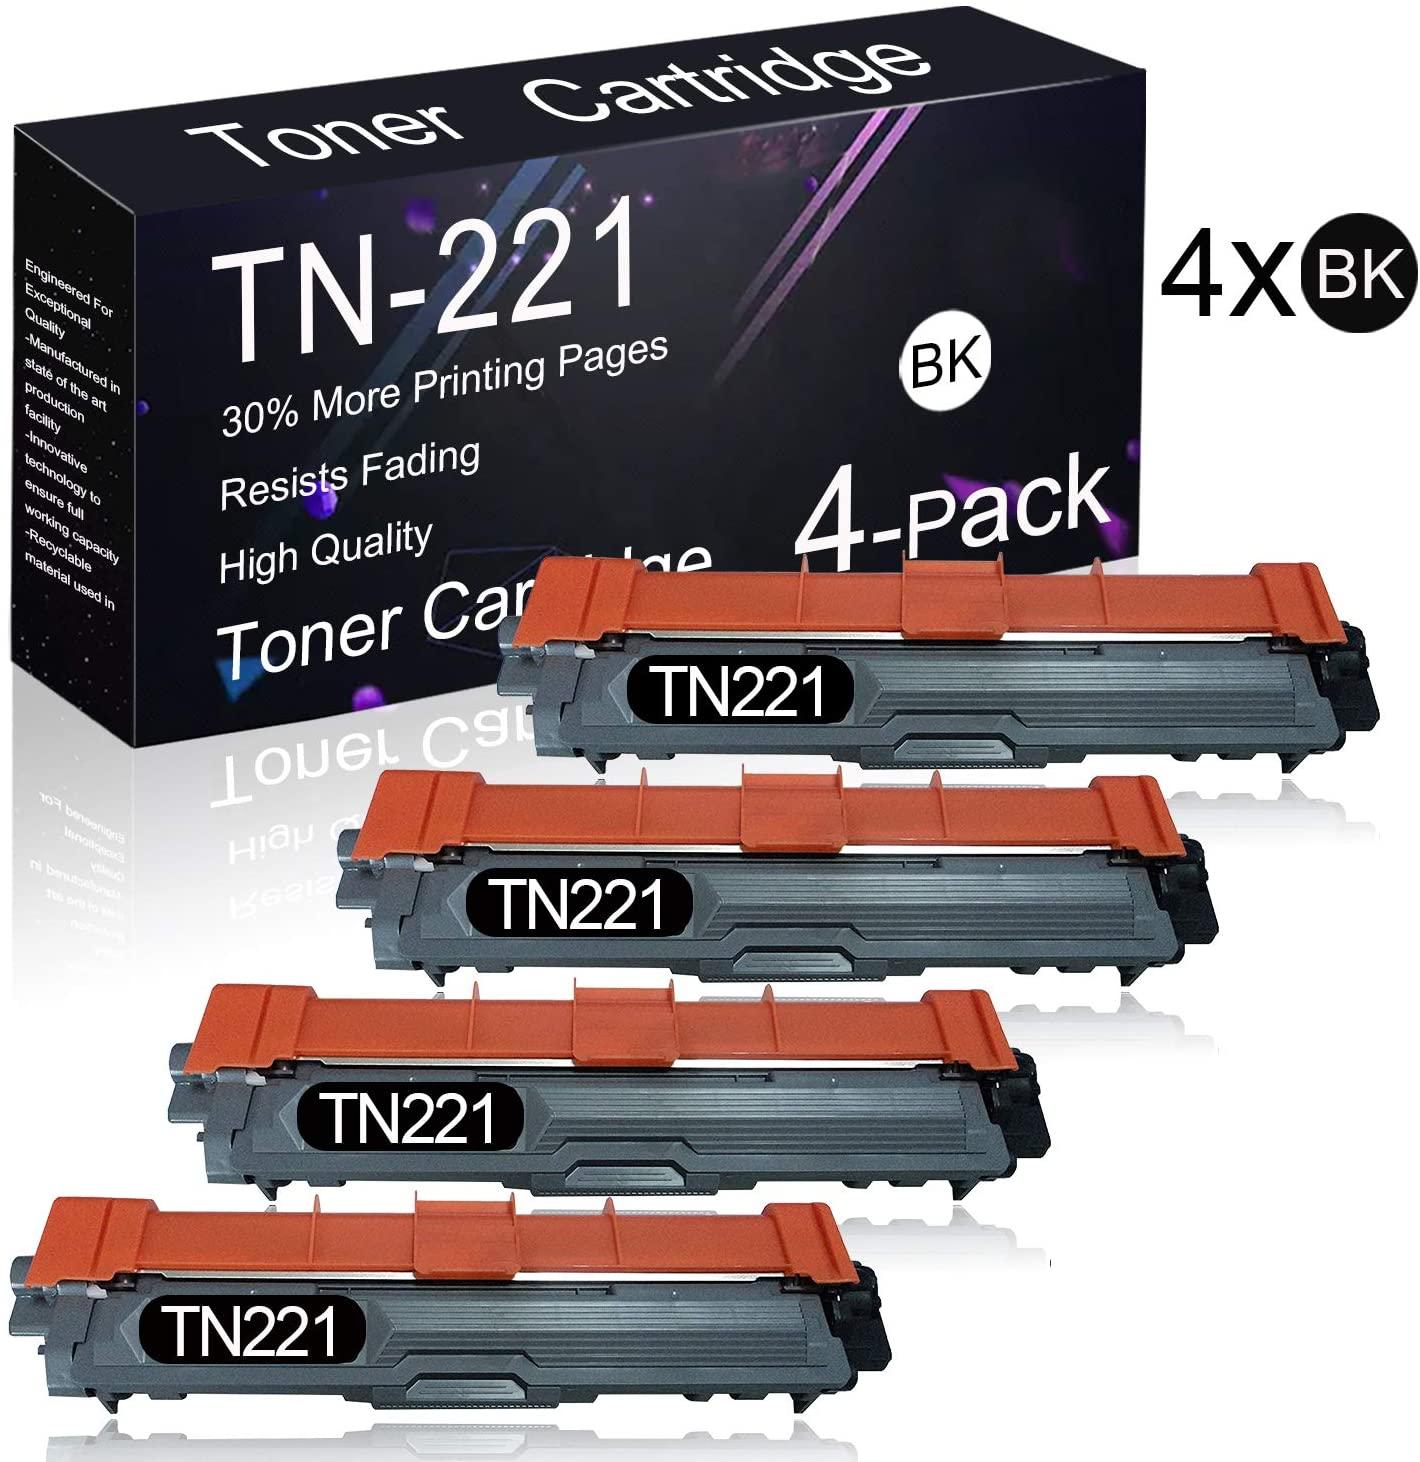 4 Pack TN221 Black Compatible Toner Cartridge Replacement for Brother HL-3140CW/ 3150CDN/ 3170CDW/ 3180CDW, MFC-9130CW/ 9140CDN/ 9330CDW/ 9340CDW, DCP-9015CDW/ 9020CDN Printers.